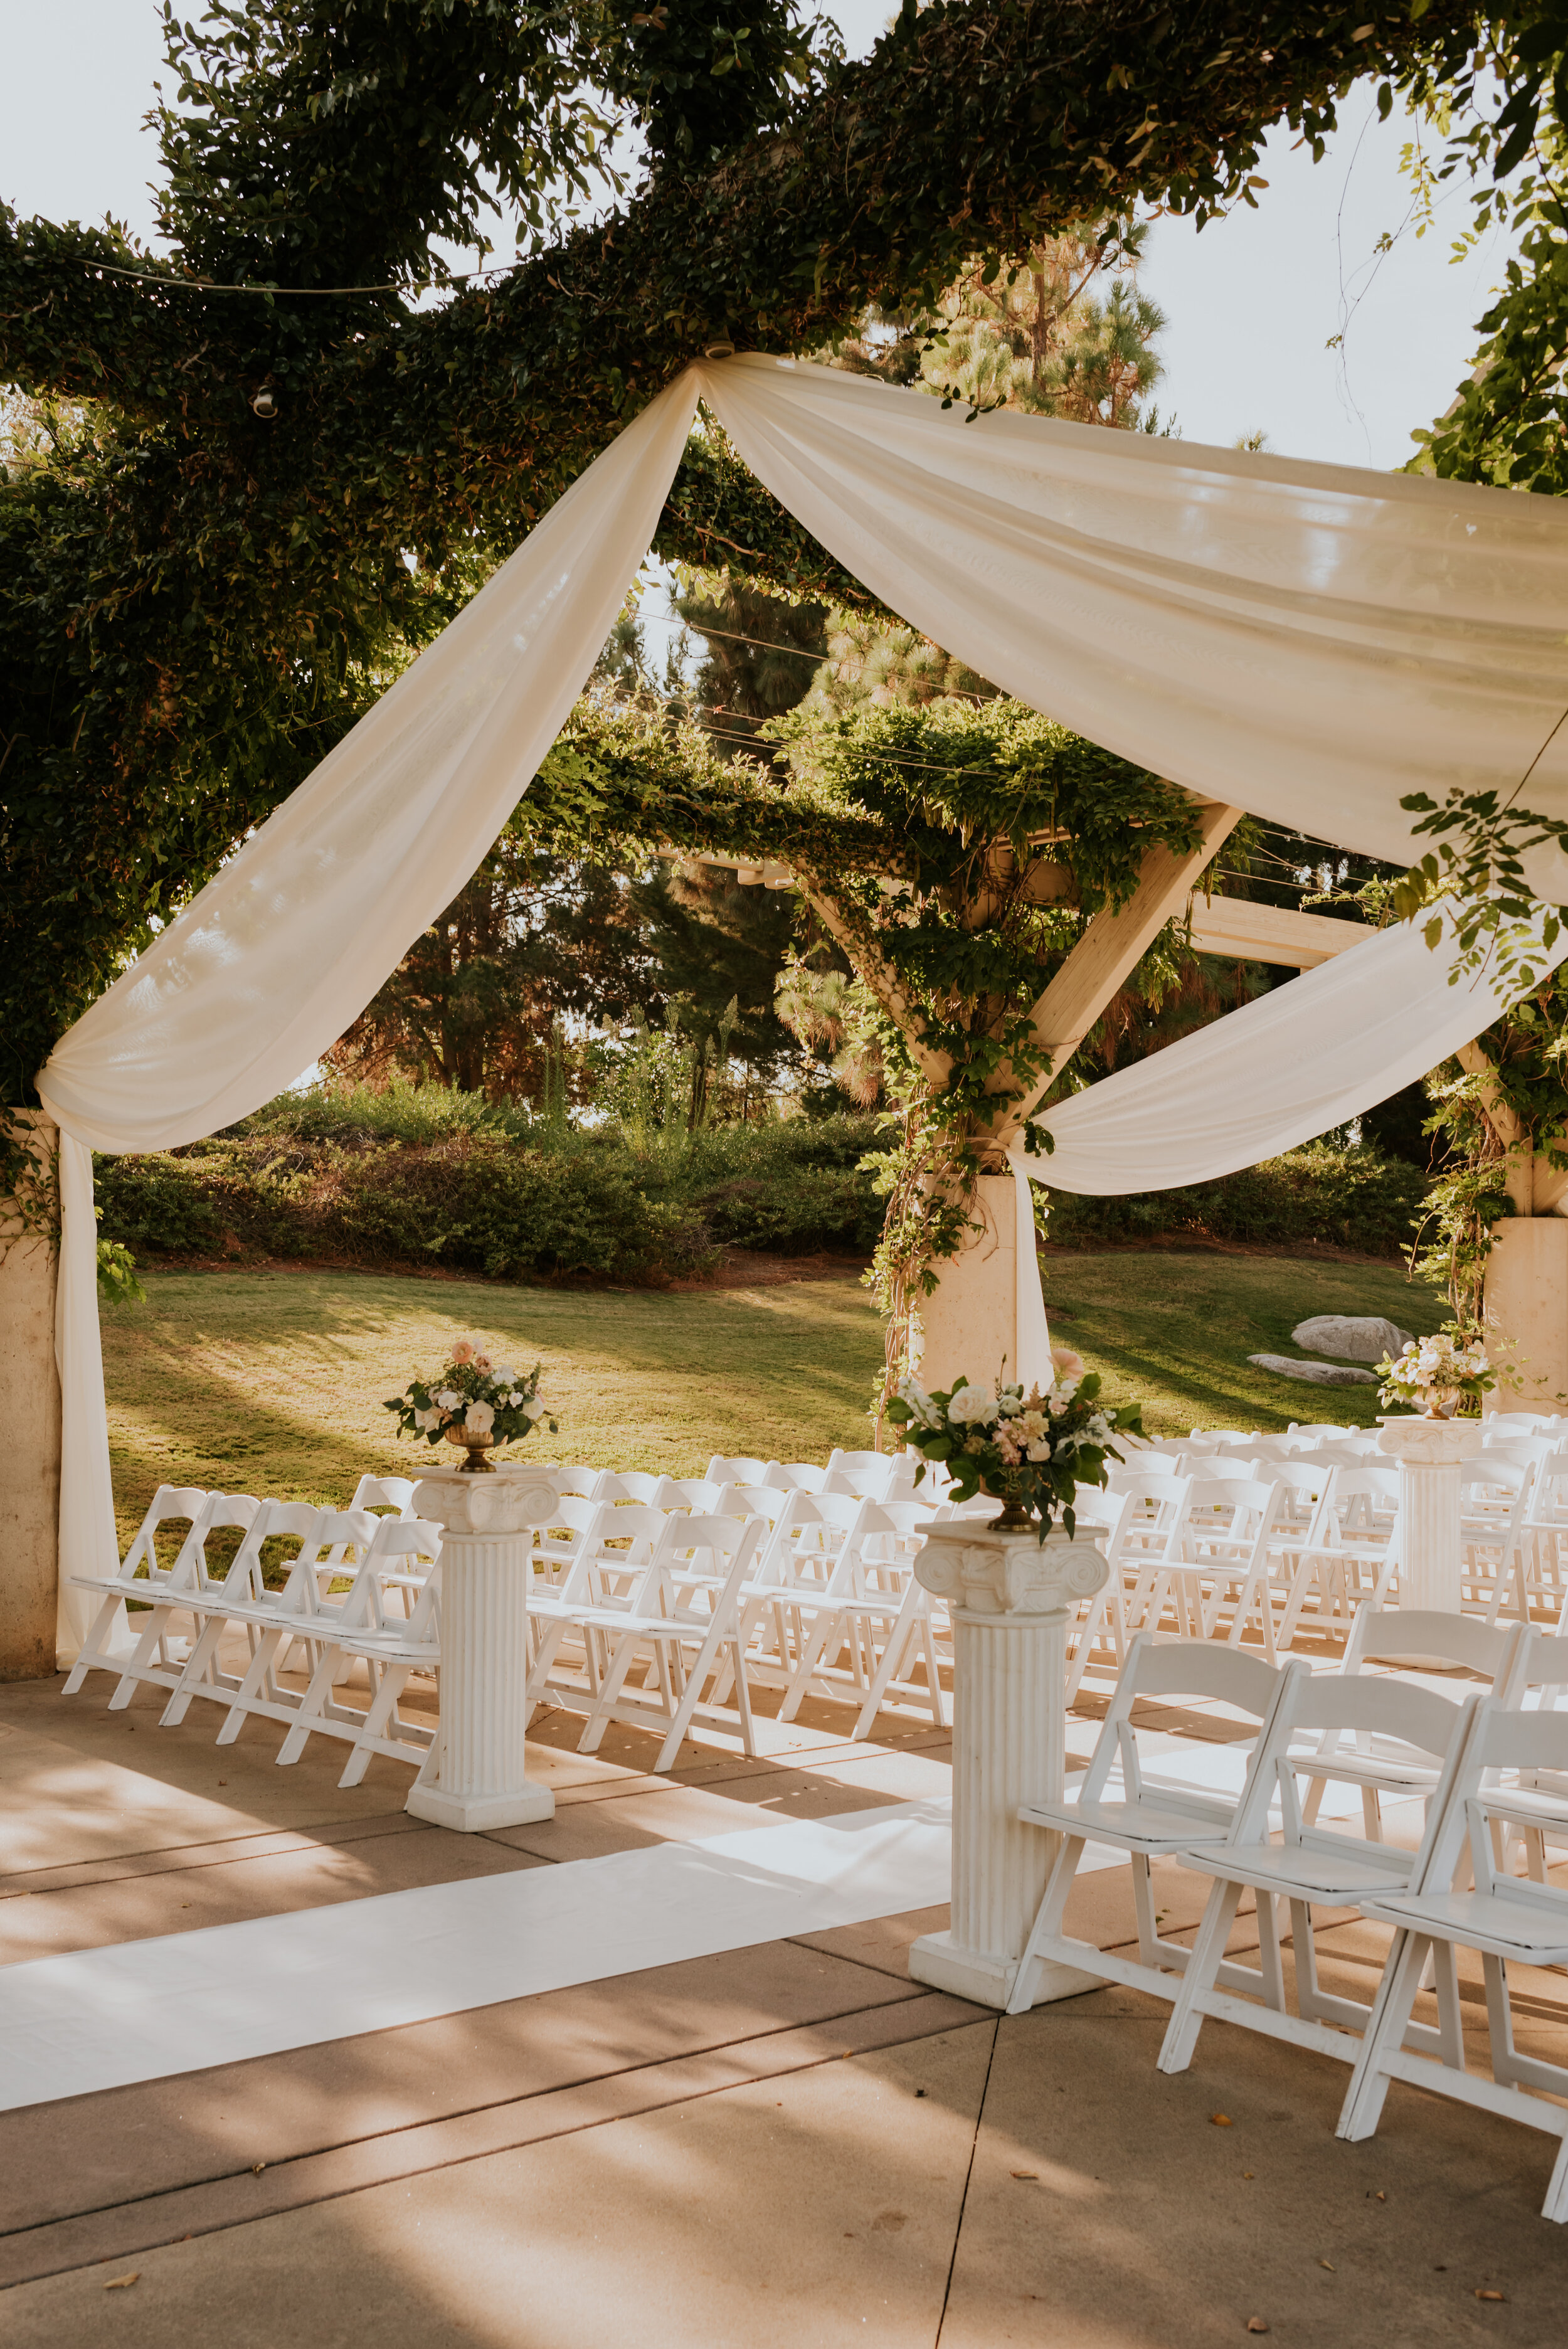 Coyote Hills Golf Course Wedding   Fullerton Wedding Photography   Fullerton Arboretum Wedding   Los Angeles Wedding Photography   Summer wedding in California   California Wedding Photographer